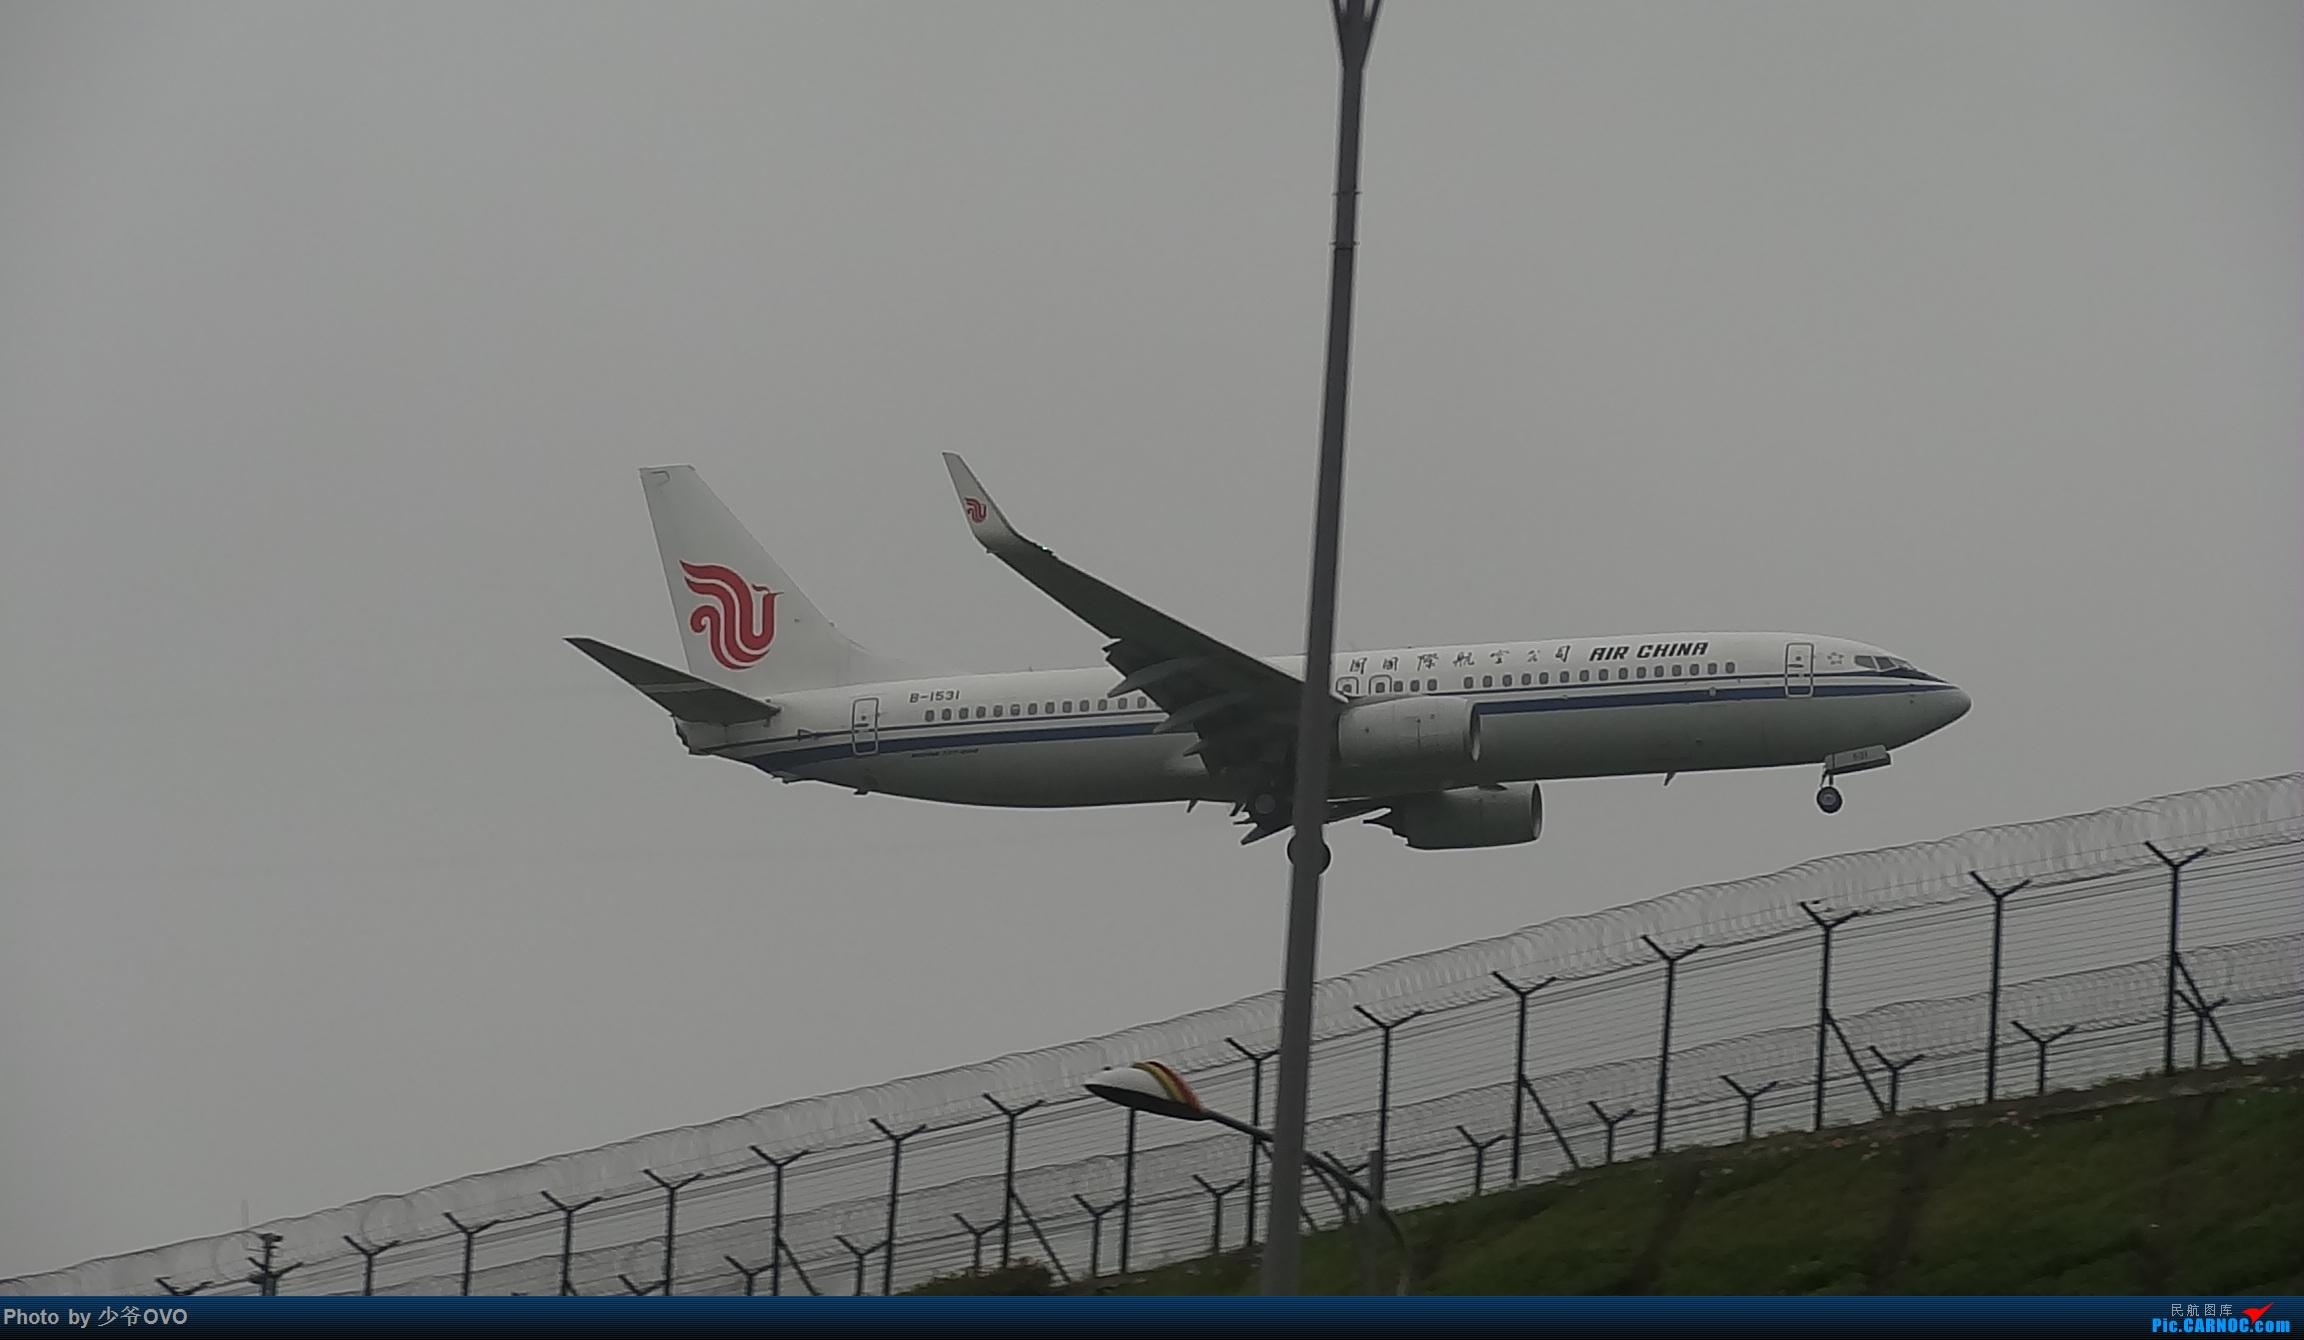 Re:[原创]CKG重庆江北机场拍机 ,渣图一堆,多指点 BOEING 737-800 B-1531 中国重庆江北国际机场